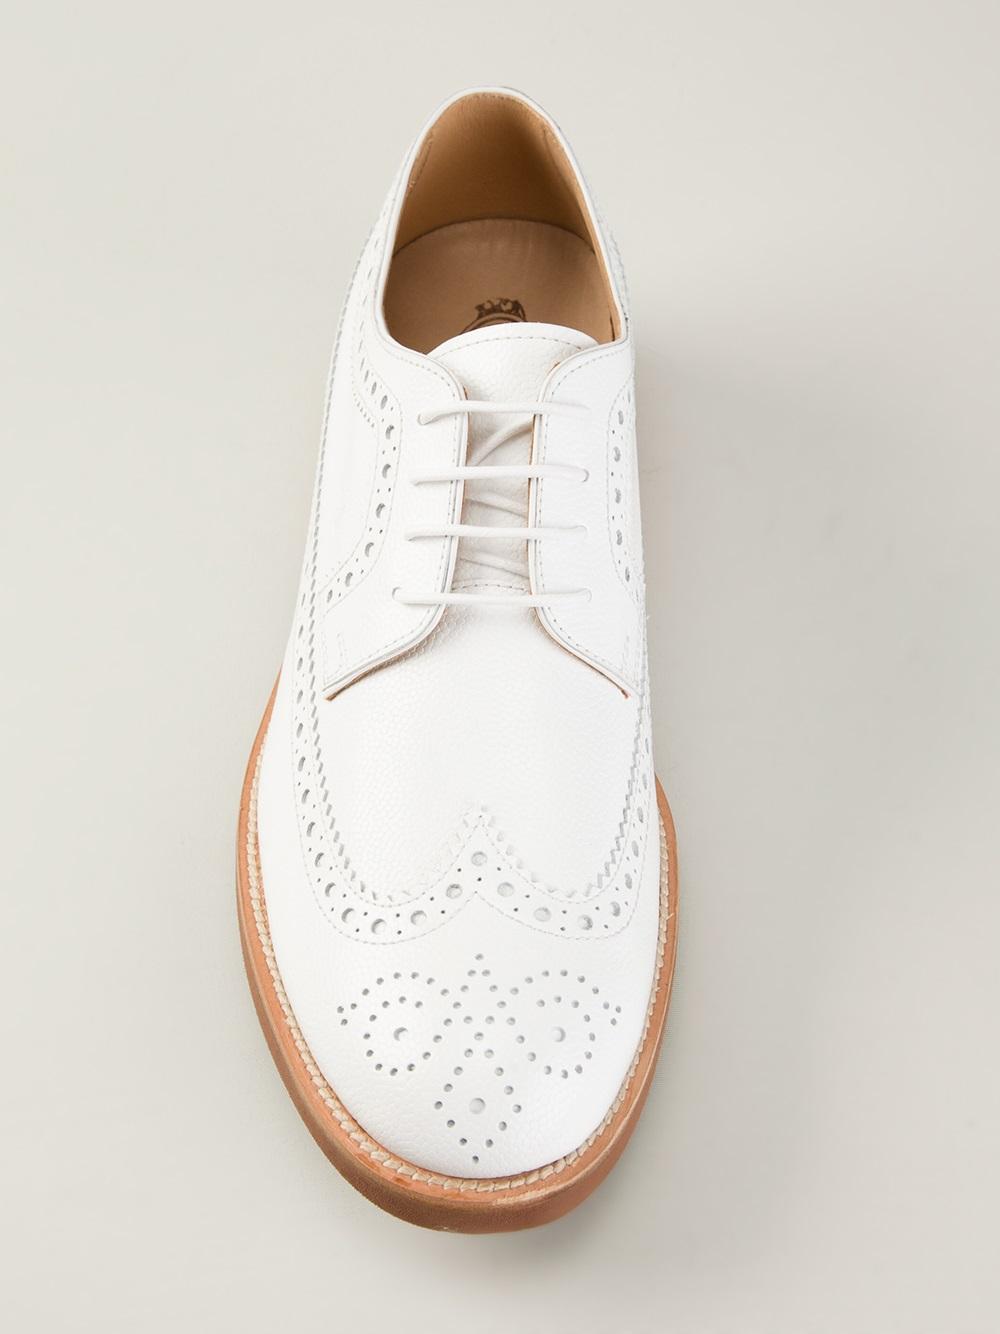 Shoes Baker Front Mens Derby Lace Up